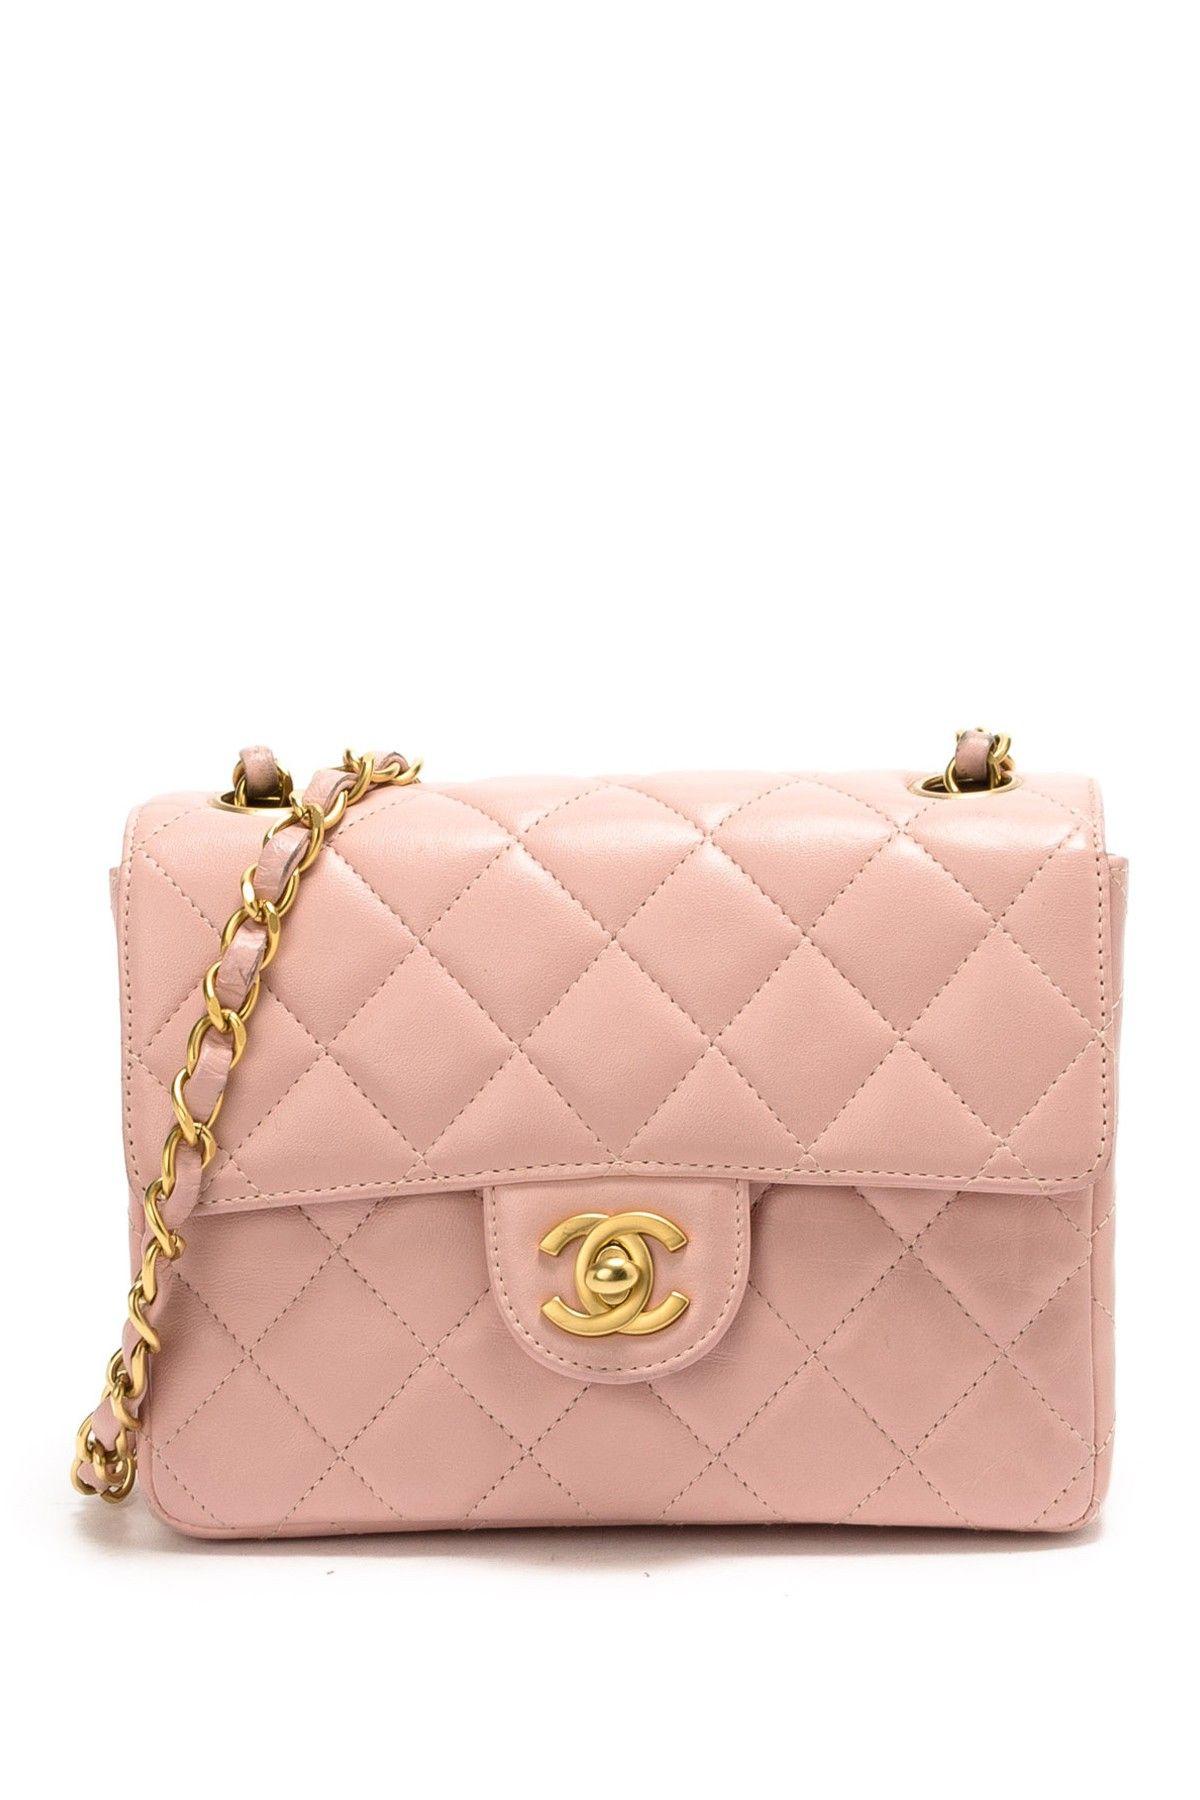 Vintage Chanel // classic design